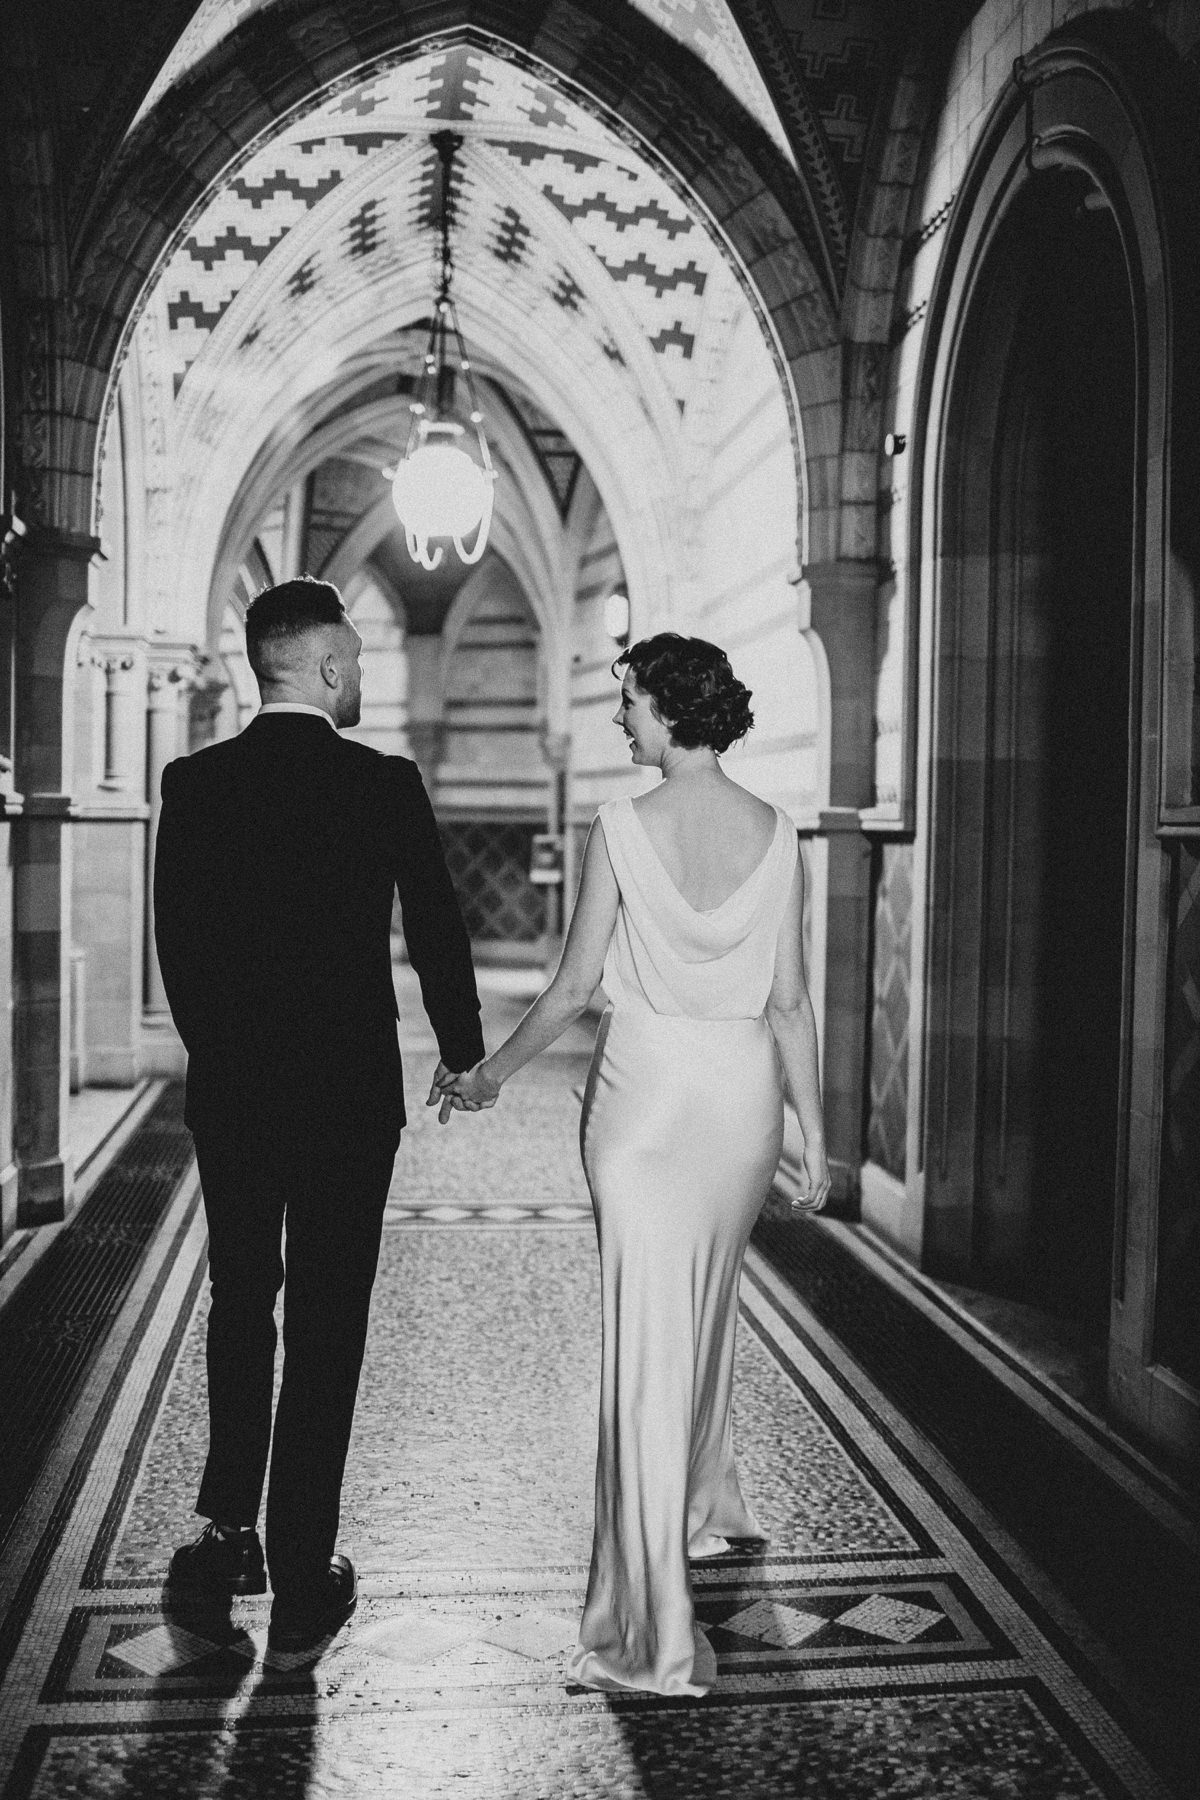 1920s vintage style wedding